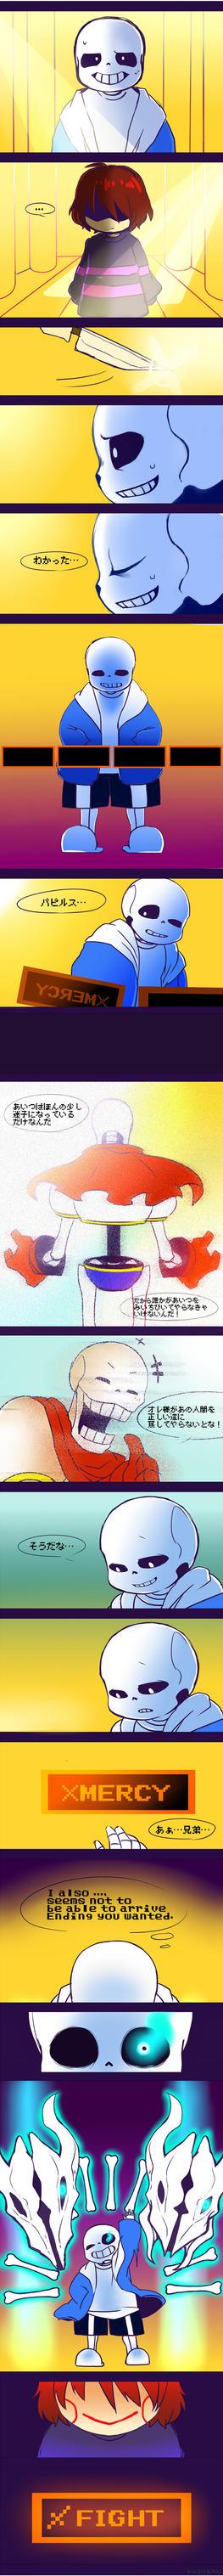 Undertale by kuzukago